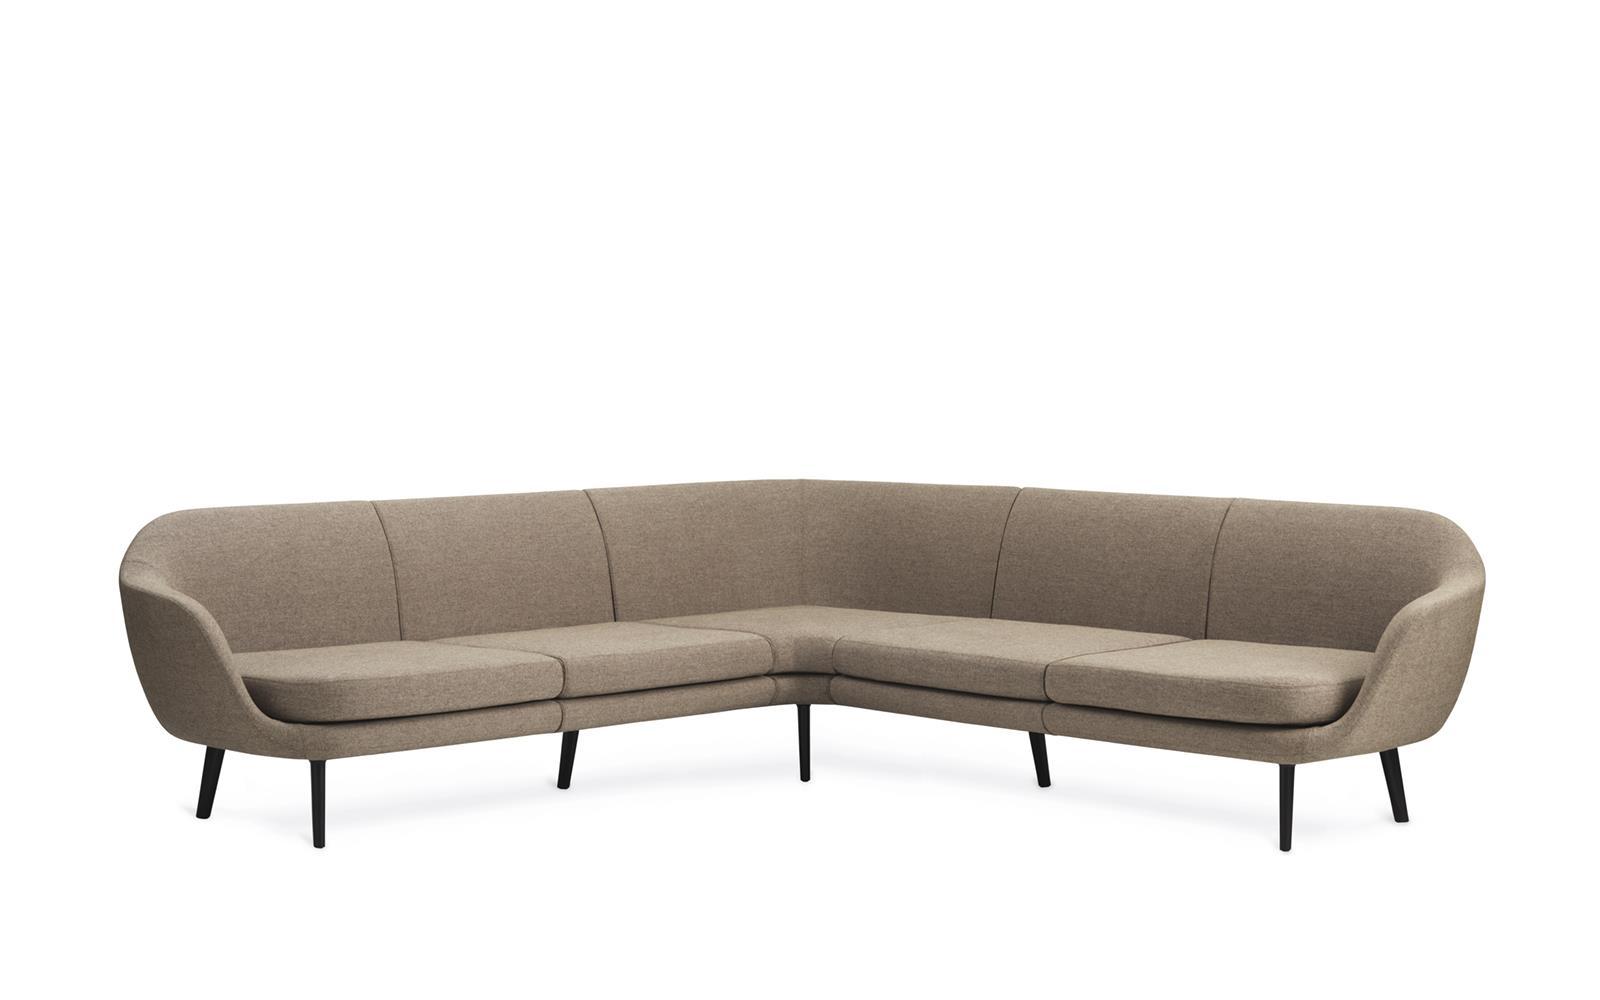 Chatnap Modular Sofa | Sofa Corner Unit | Loaf | Loaf